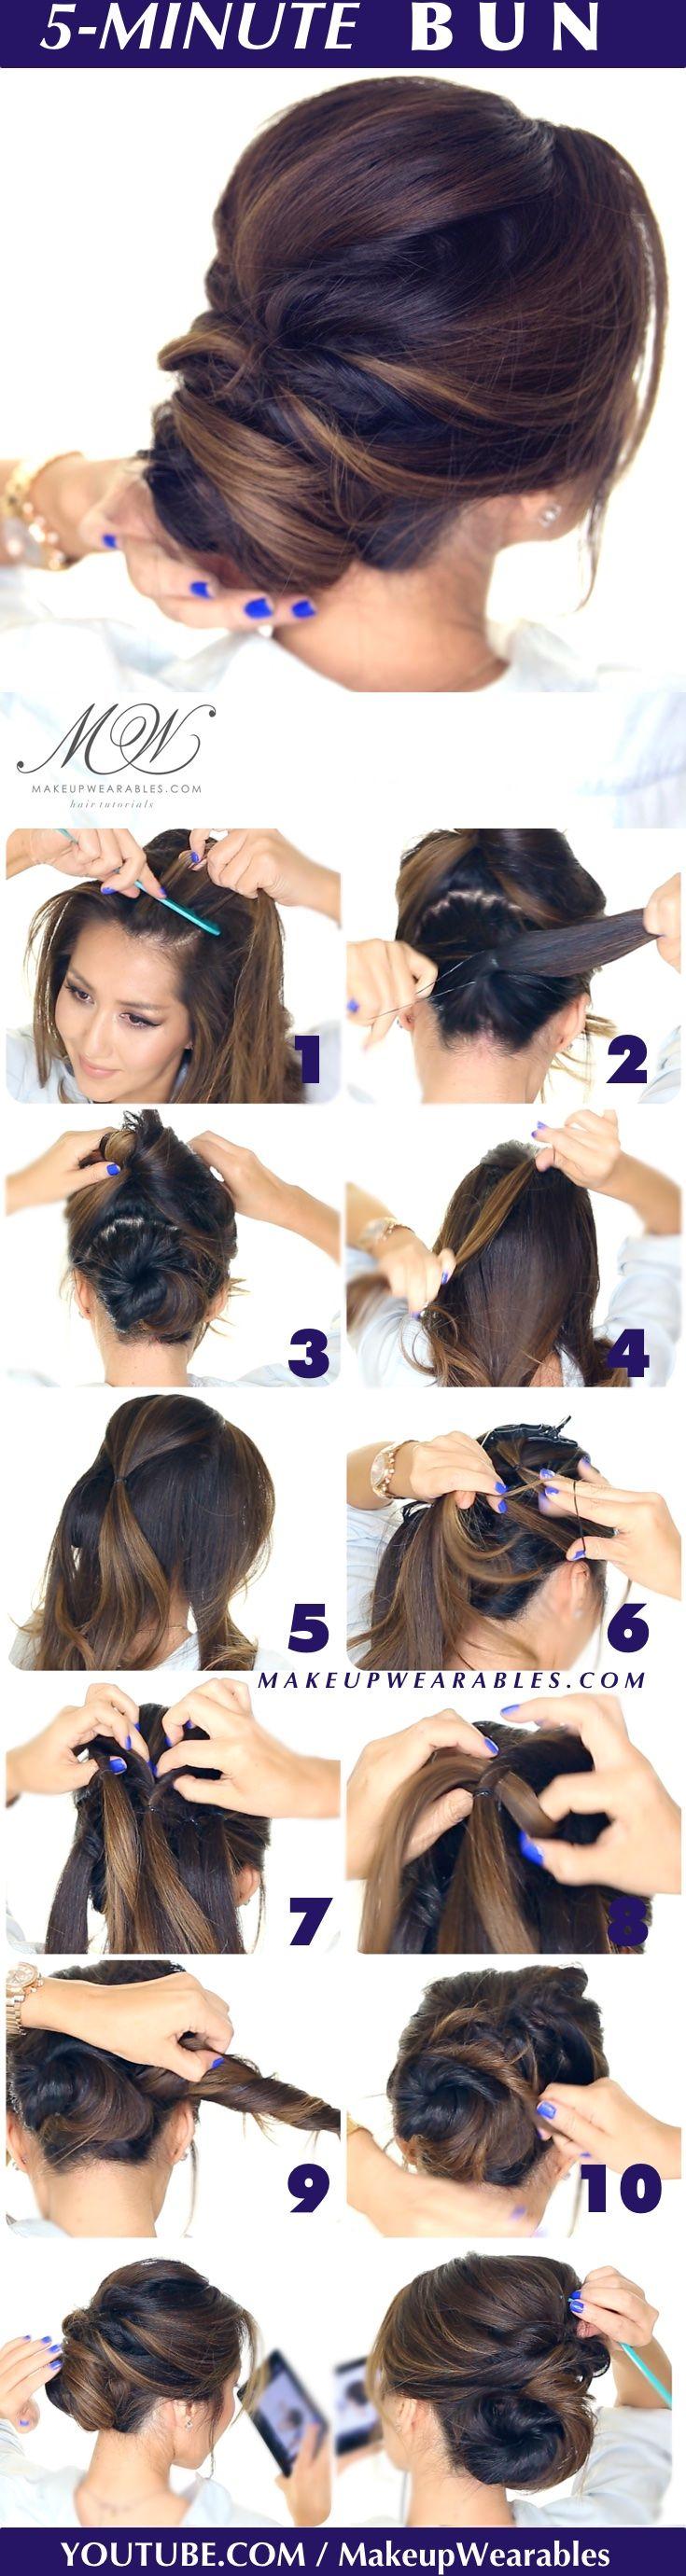 Marvelous Buns Elegant Bun And Bun Hairstyles On Pinterest Hairstyles For Women Draintrainus